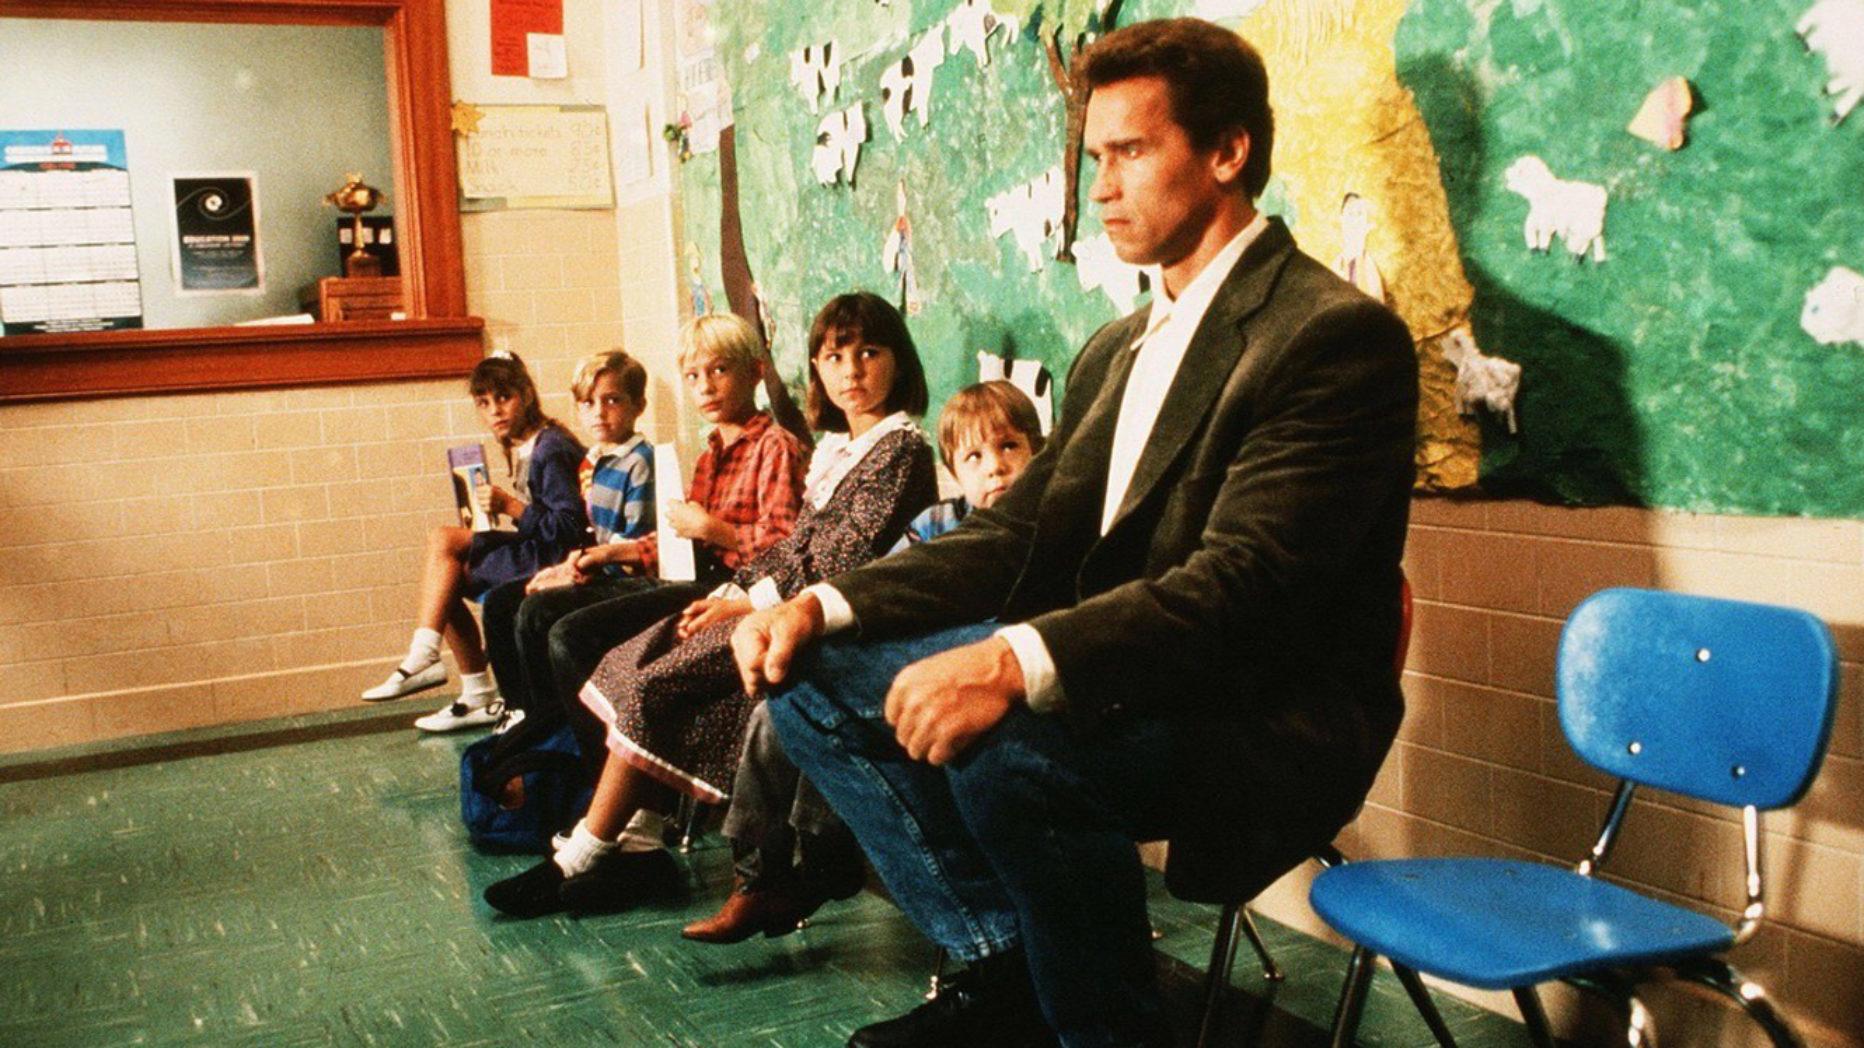 Arnie's Top Ten Movie Puns Kindergarten Cop